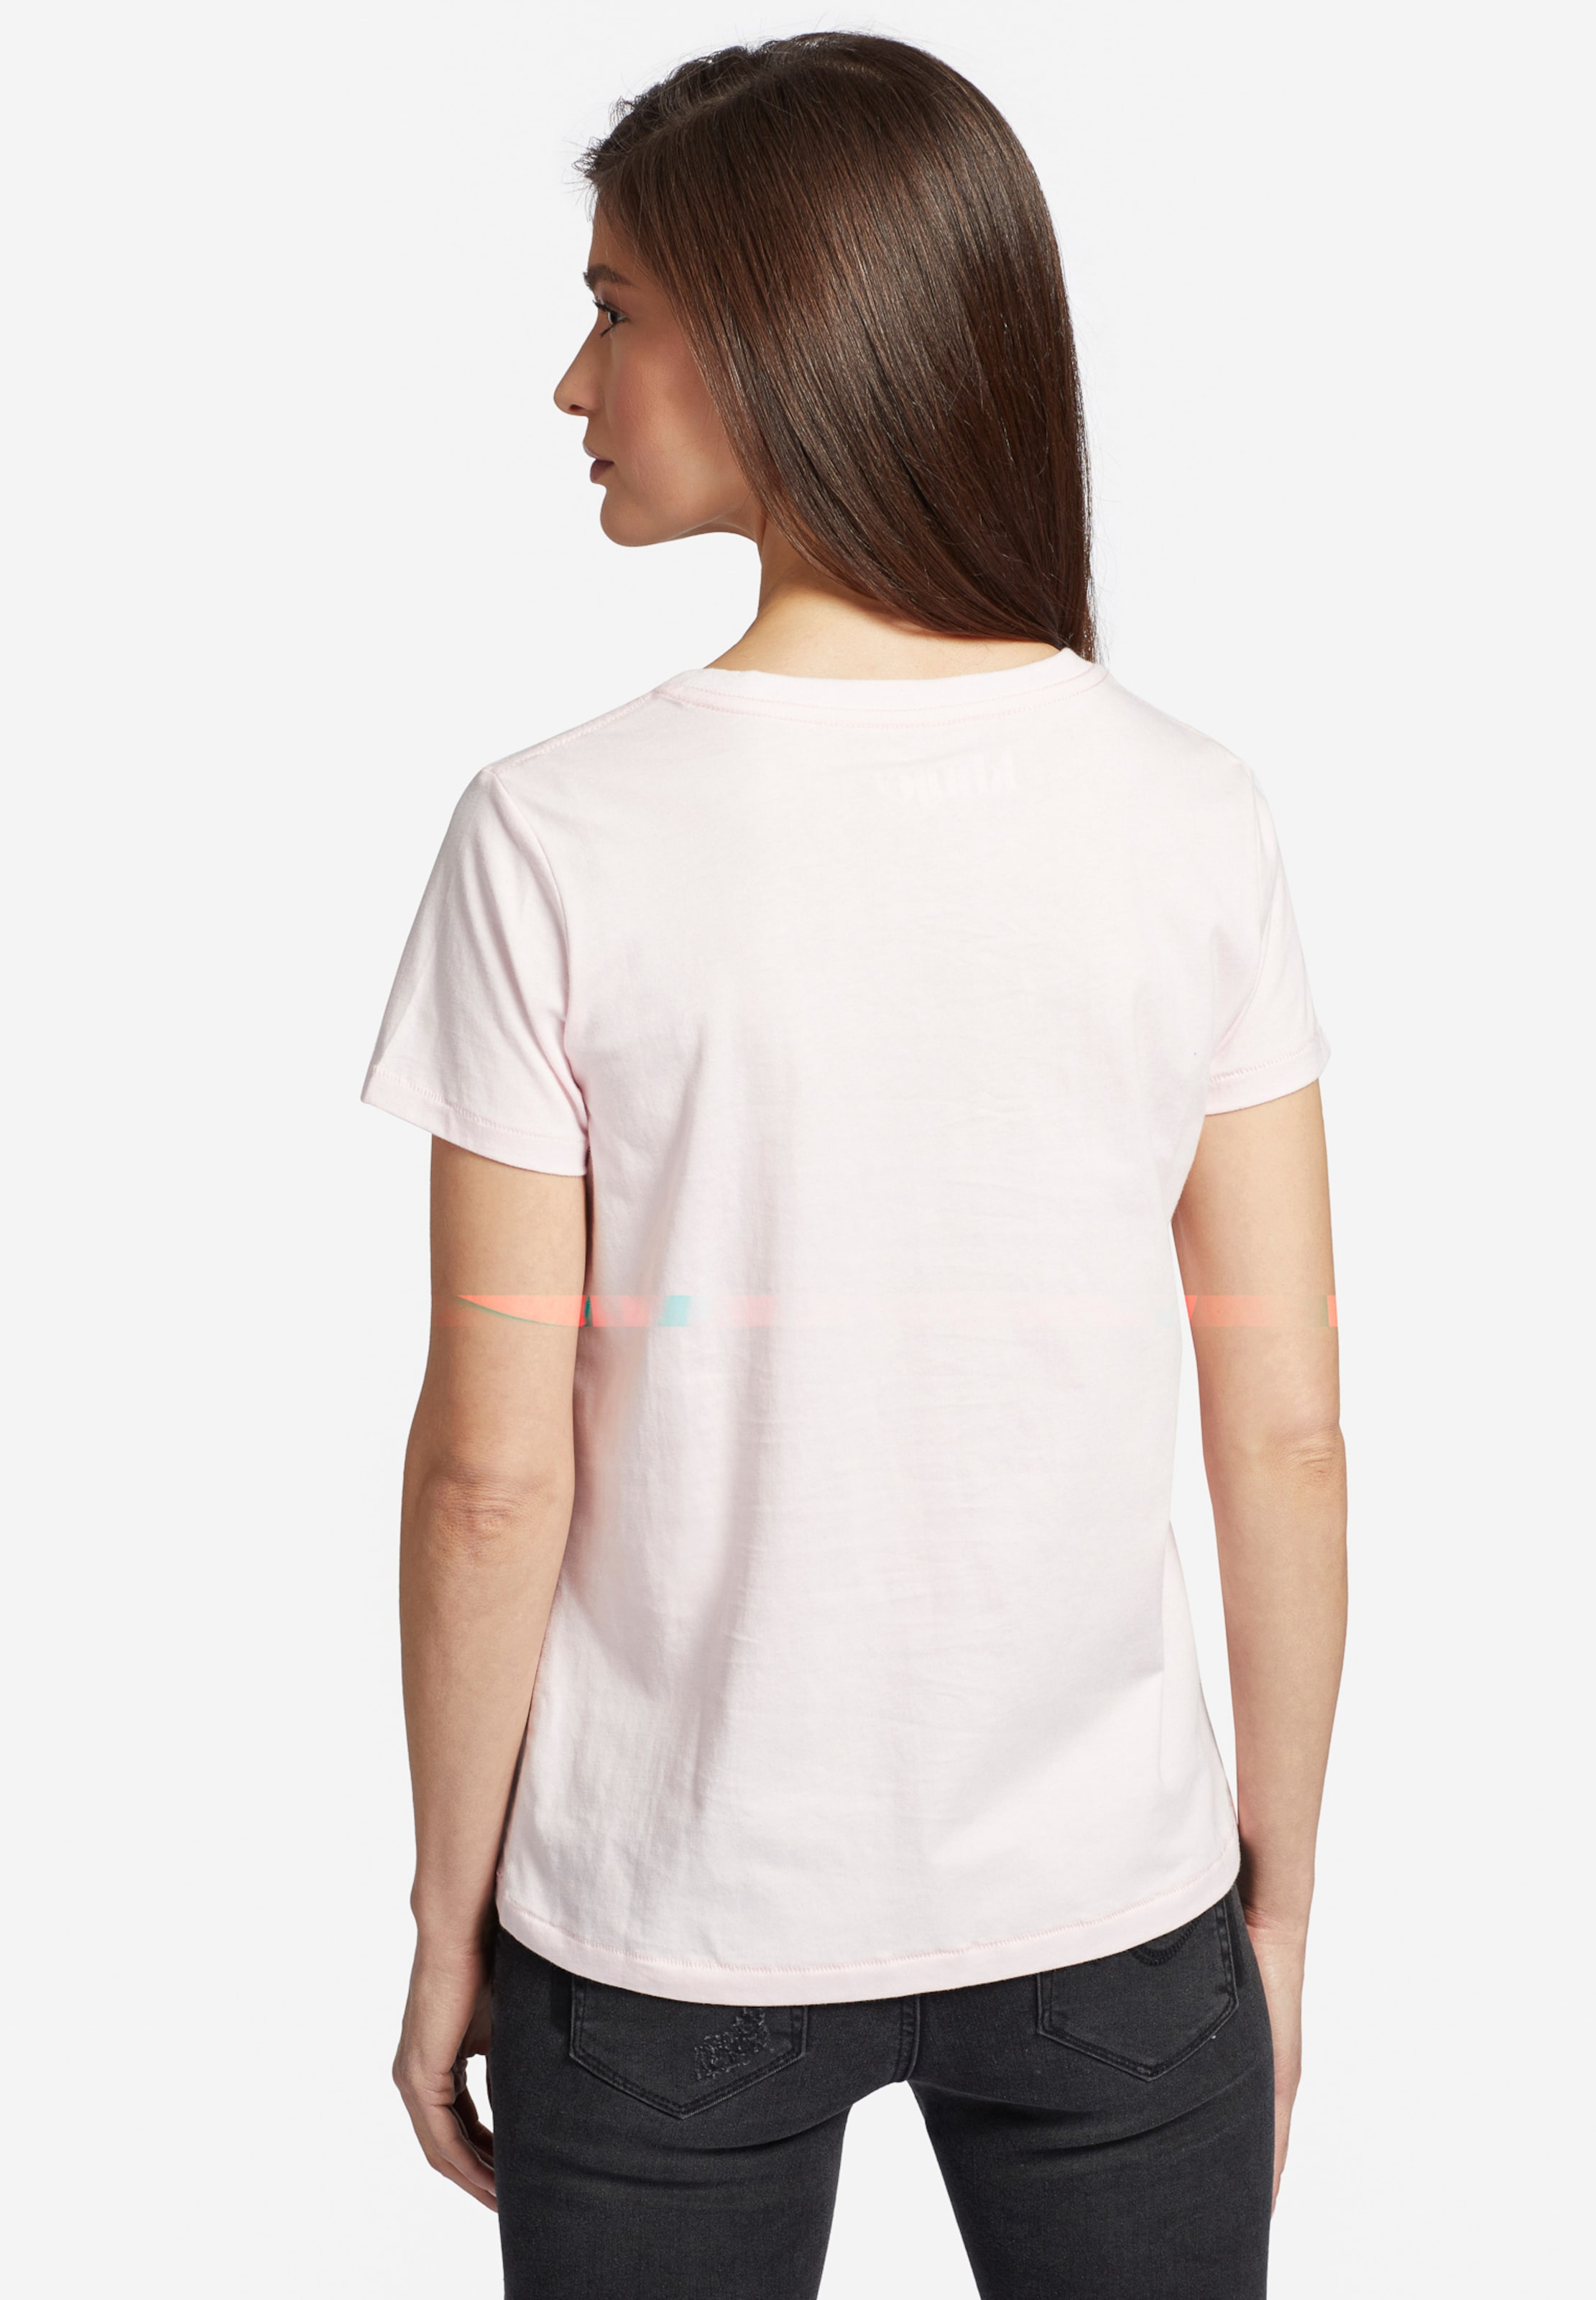 T shirt 'brooke HimmelblauRosa Khujo In Pitaya Logo' EDH9I2